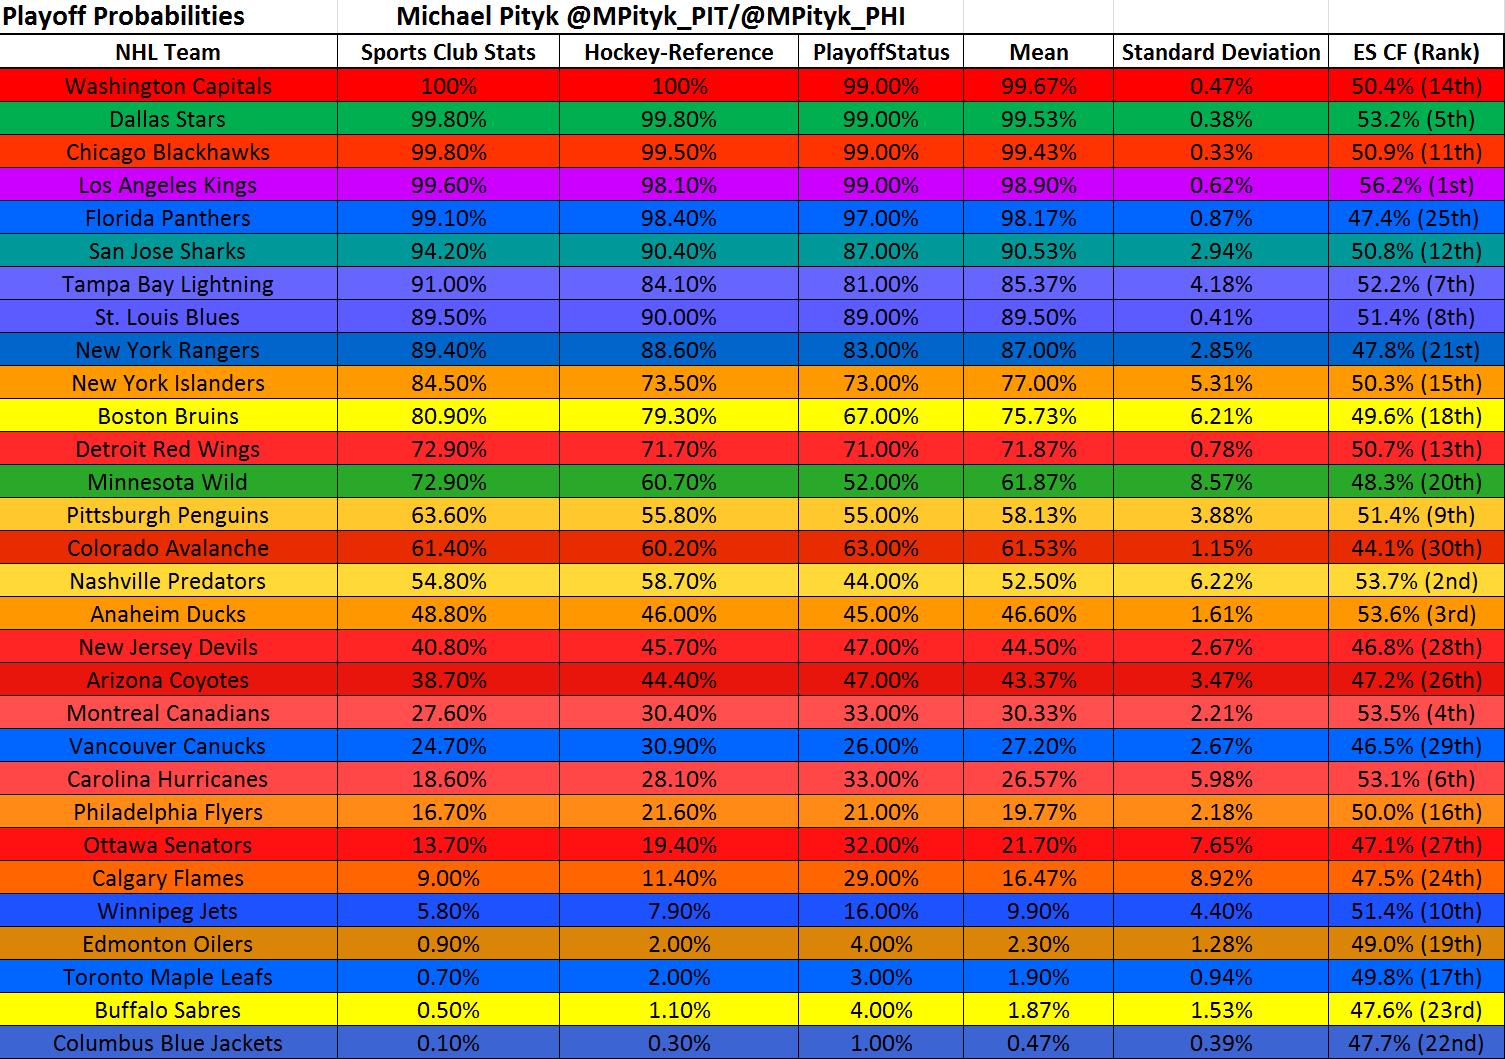 NHL Playoff Probabilities